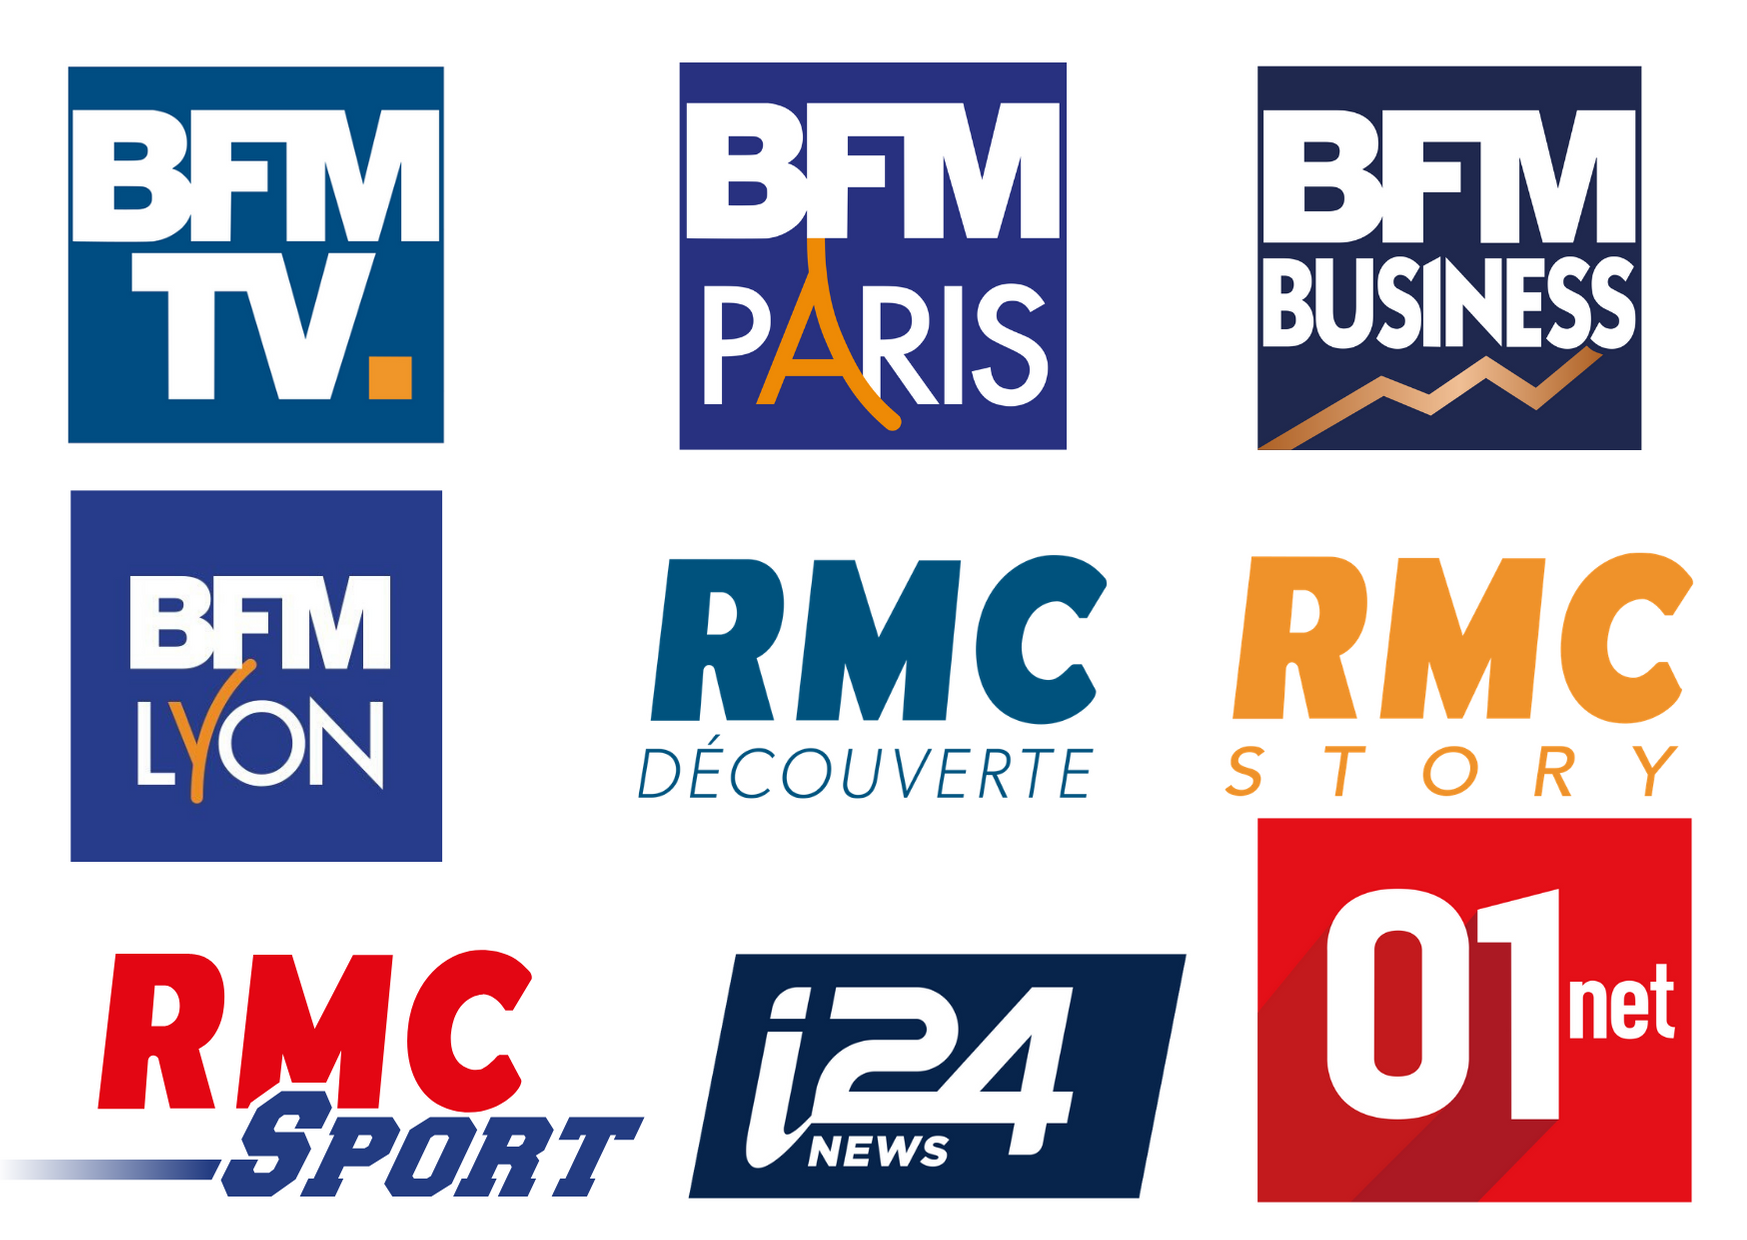 Logos de RMC BFM etc...